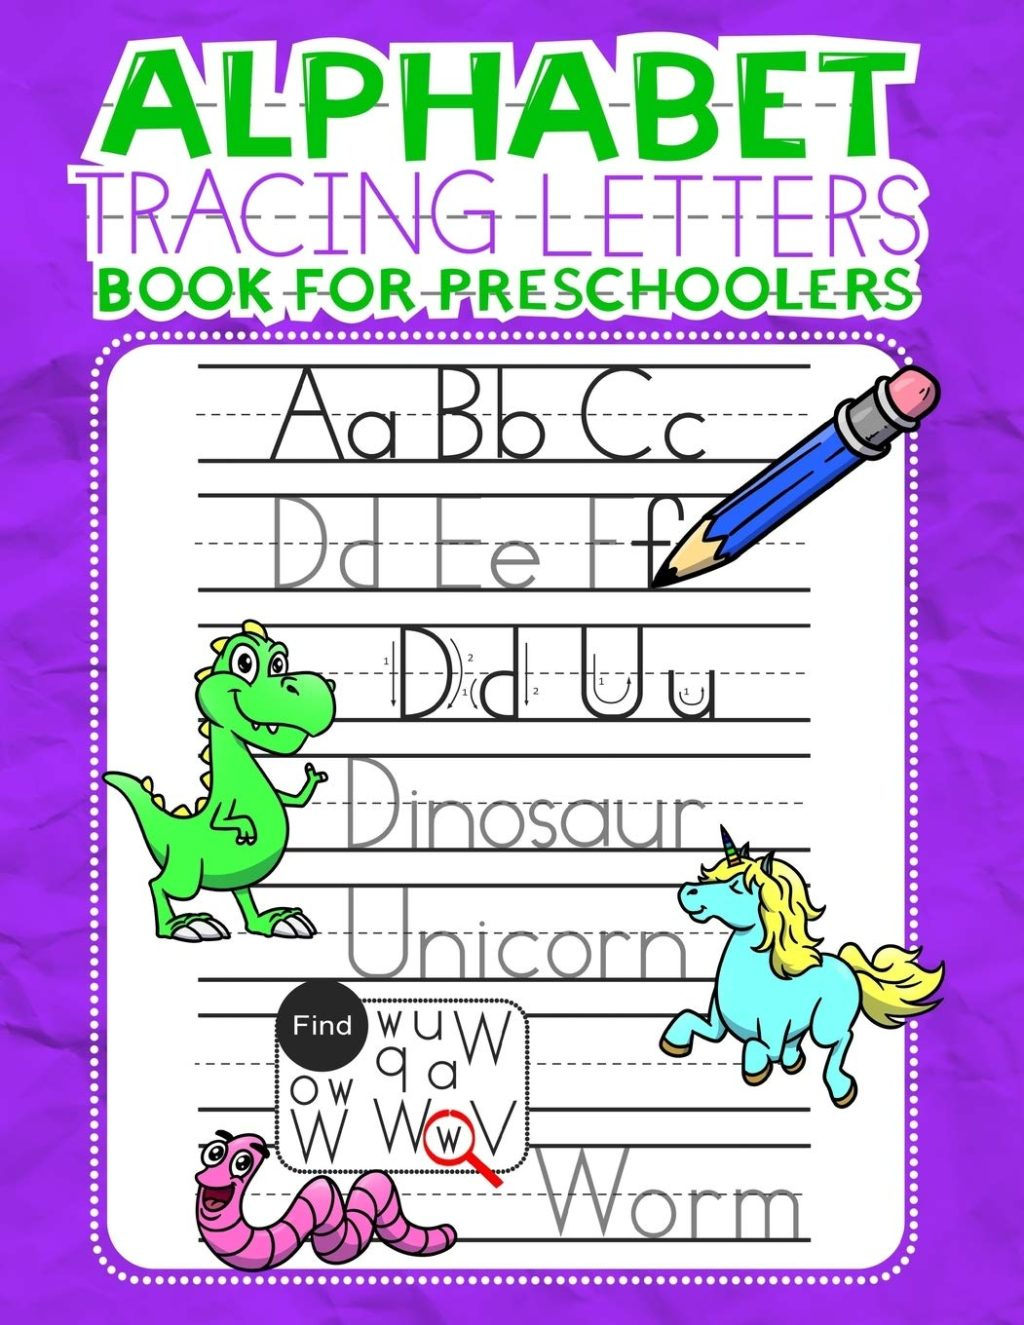 Worksheet ~ 71Jqtlkvmbl Alphabet Tracing Letters Book For